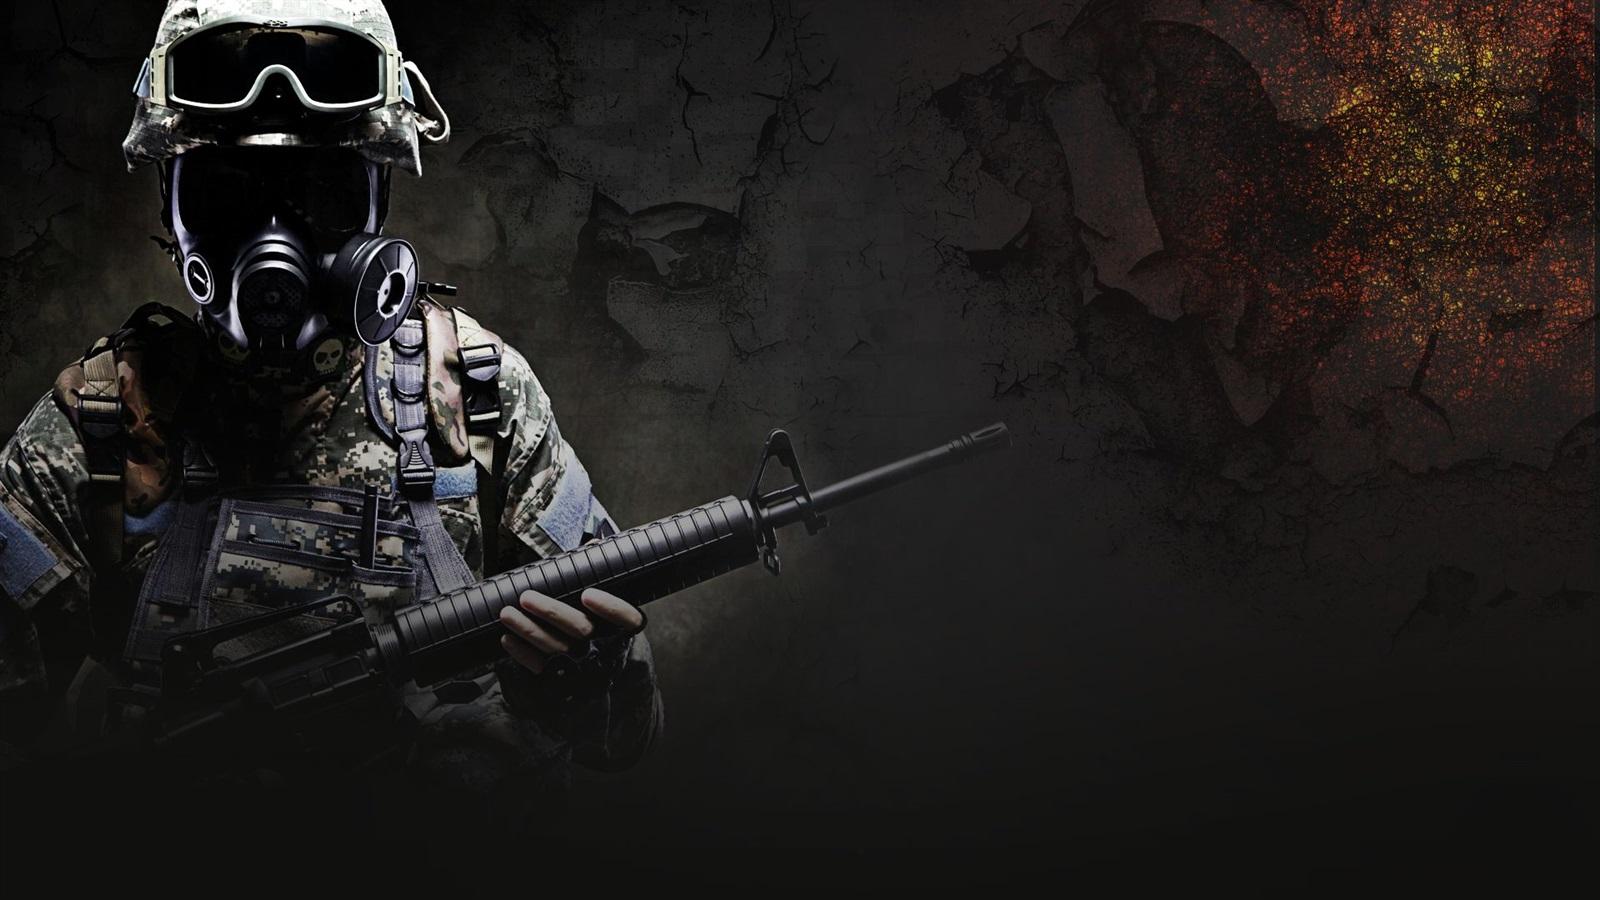 Wallpaper CS GO soldier 1920x1080 Full HD 2K Picture Image 1600x900